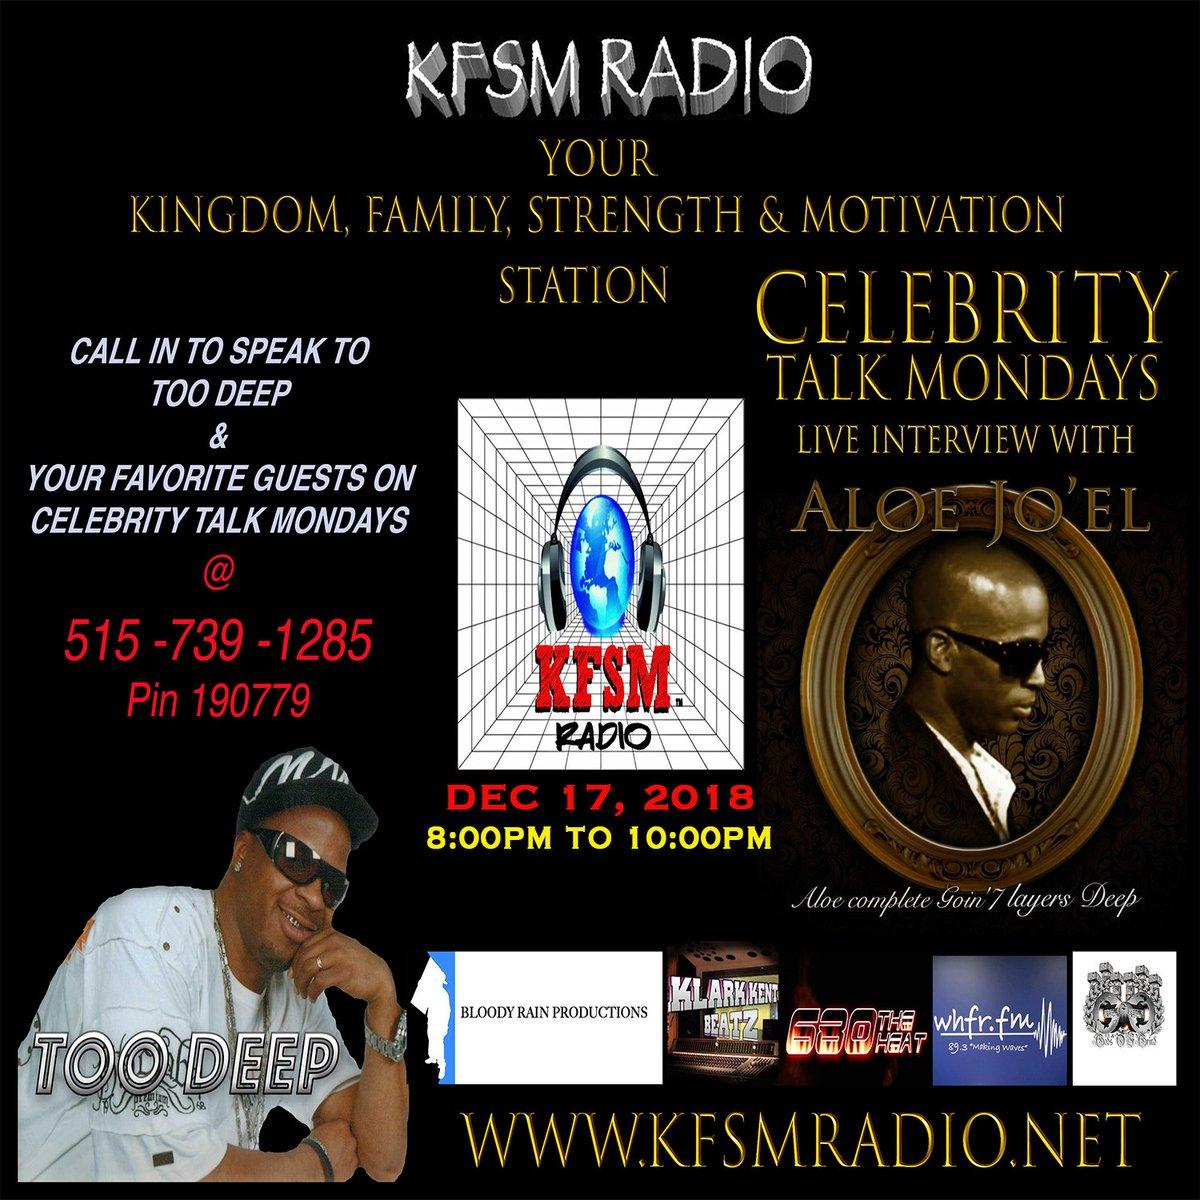 Dec. 17, 2018 Aloe Joel #Celebrity #Talk #Monday 12/17/18 at 9pm #EST@aloejoel#Call5157391285 Pin 190779 www.http://kfsmradio.net/ @imtoodeep @kfsmradio#UK #RADIO #US@Qbosilini423